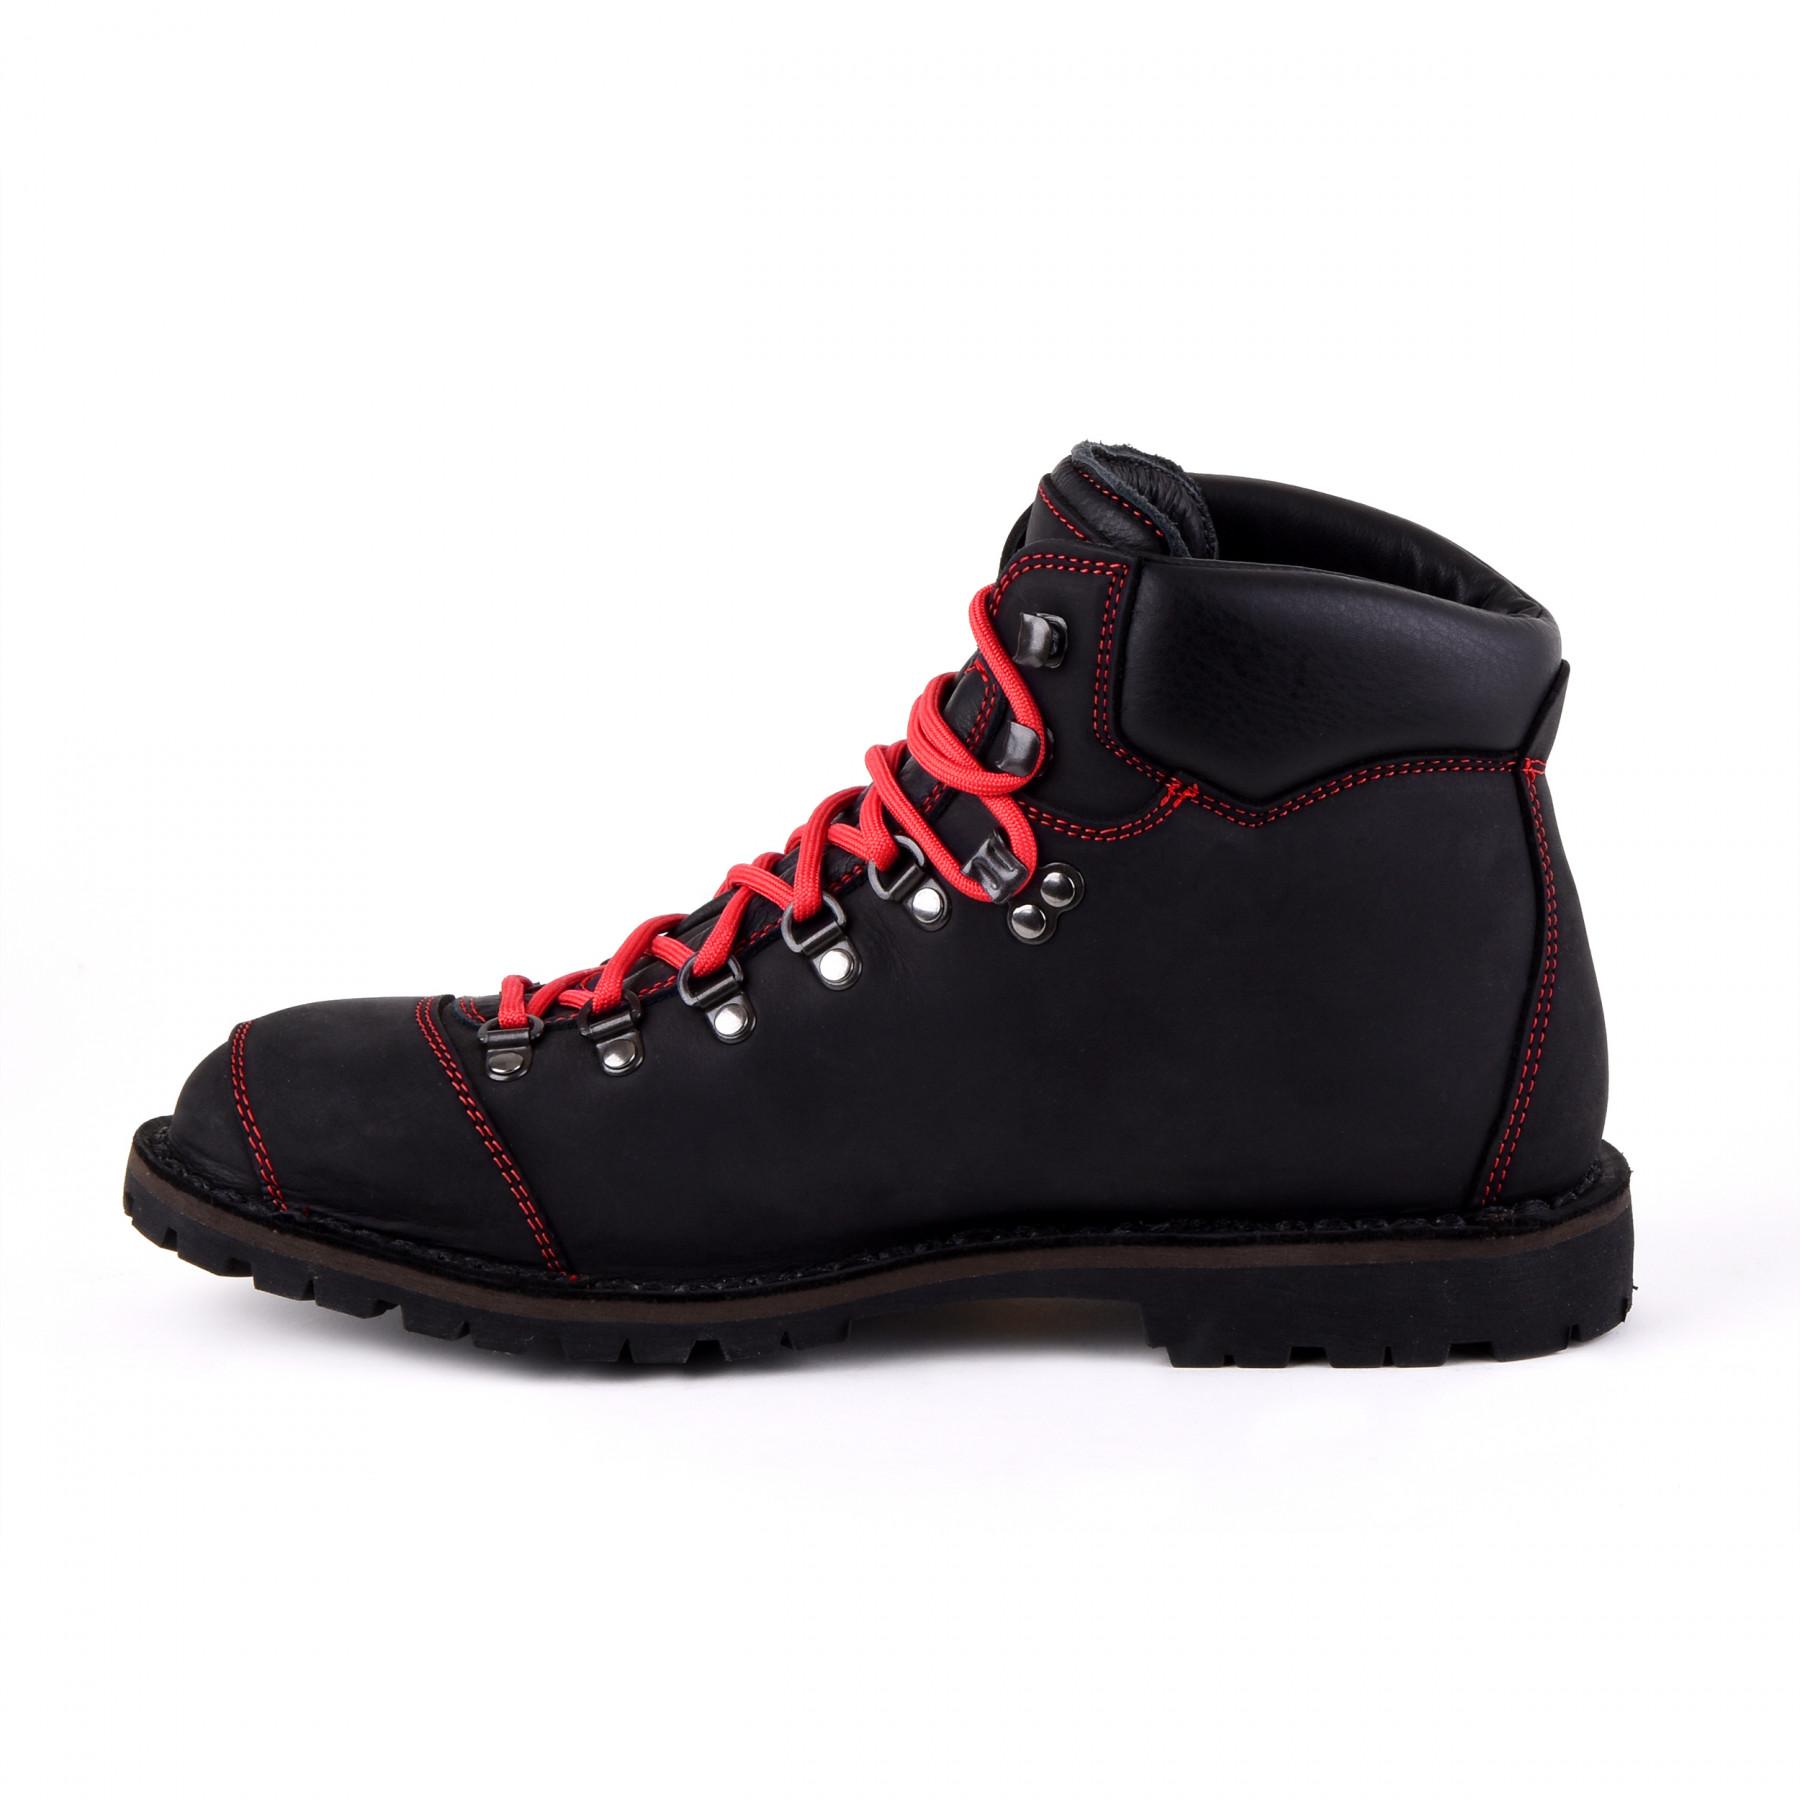 Biker Boot Adventure Denver Black, schwarze Herren Stiefel, rote Nähte